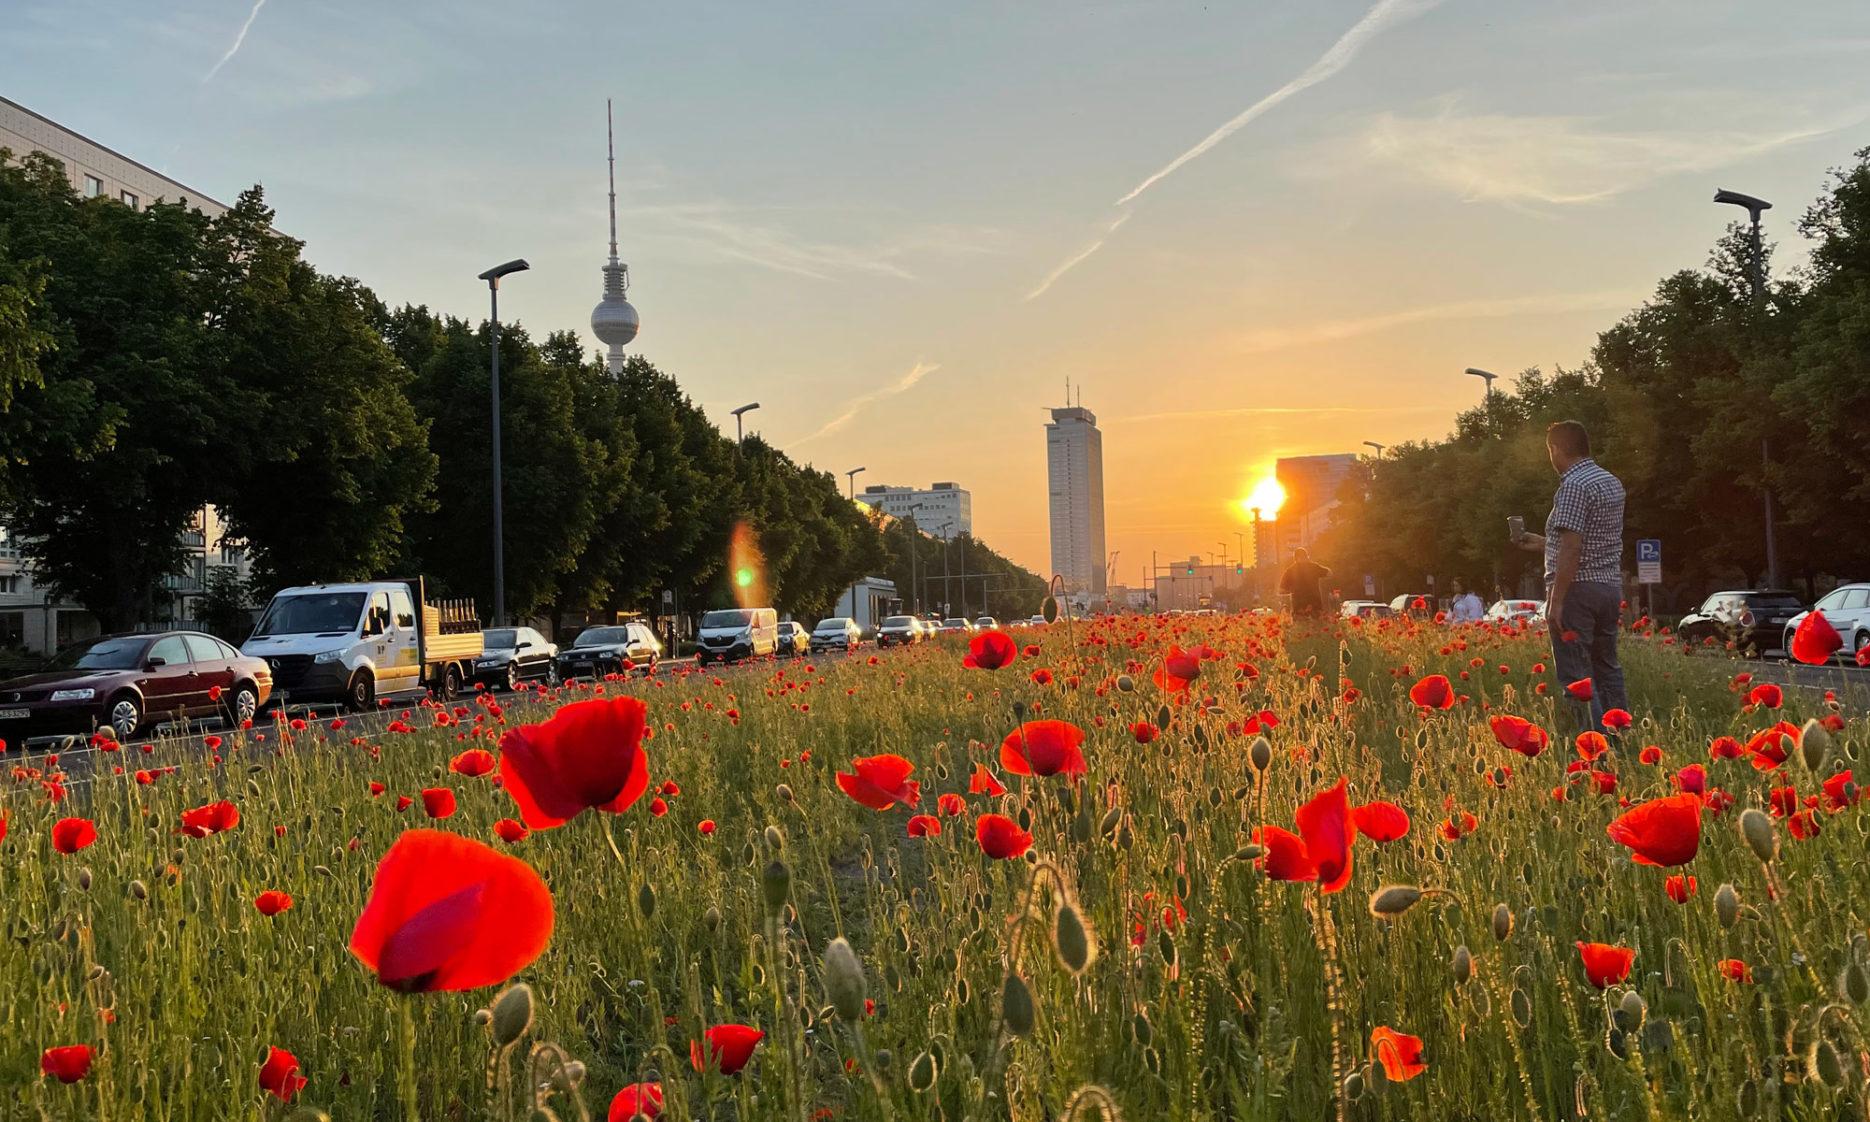 Mohnblumen im Sonnenuntergang Berlin